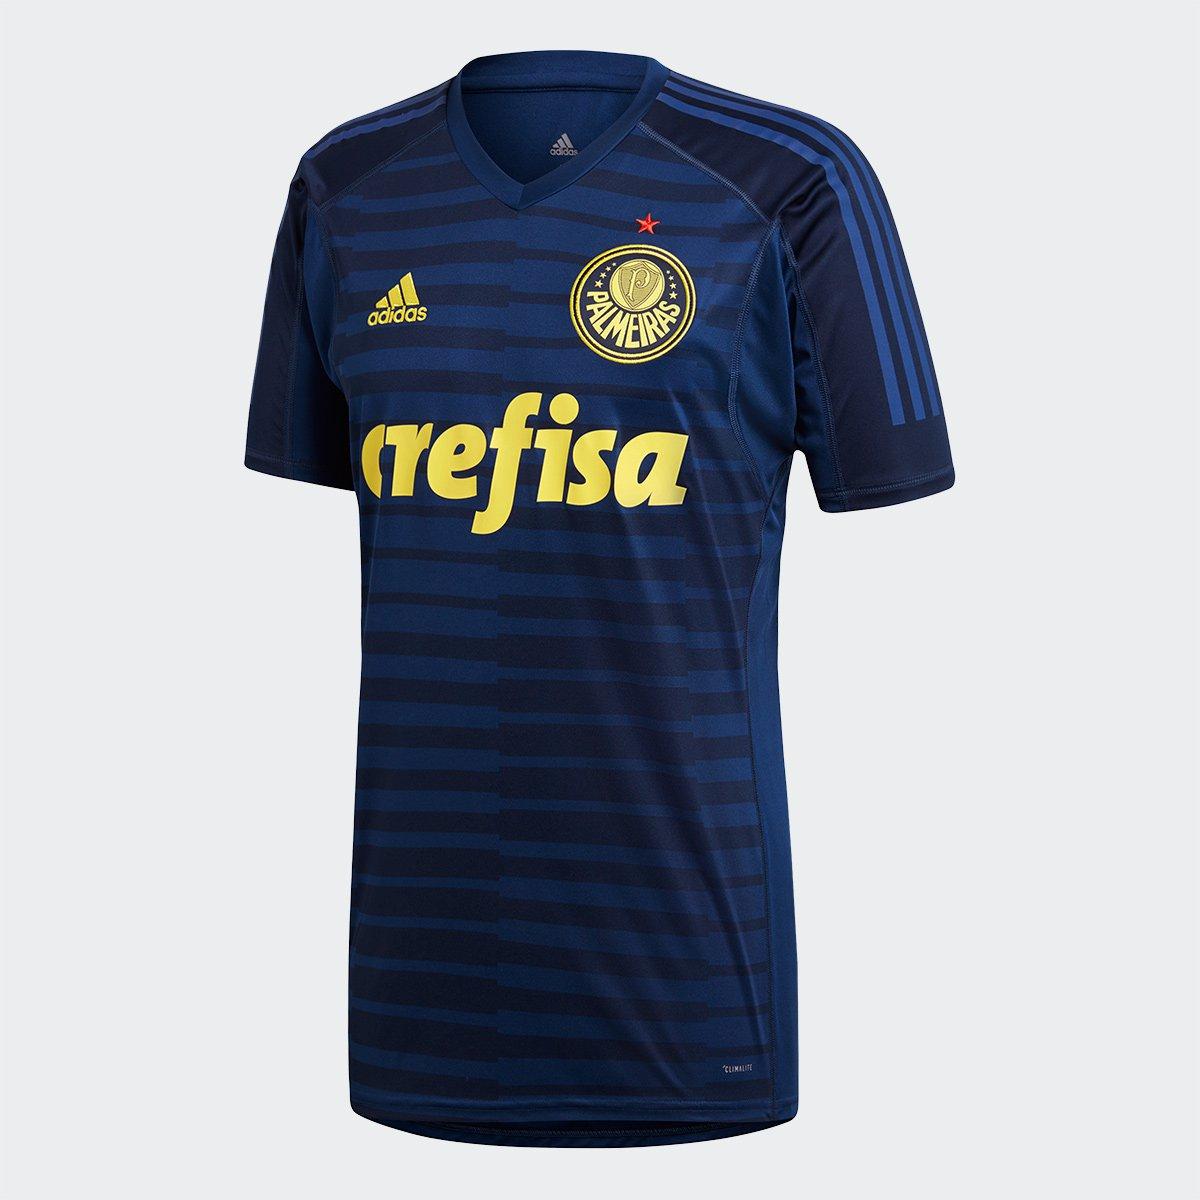 1e17b222289c7 Camisa de Goleiro Palmeiras 2018 s n° - Torcedor Adidas Masculina - Azul -  Compre Agora